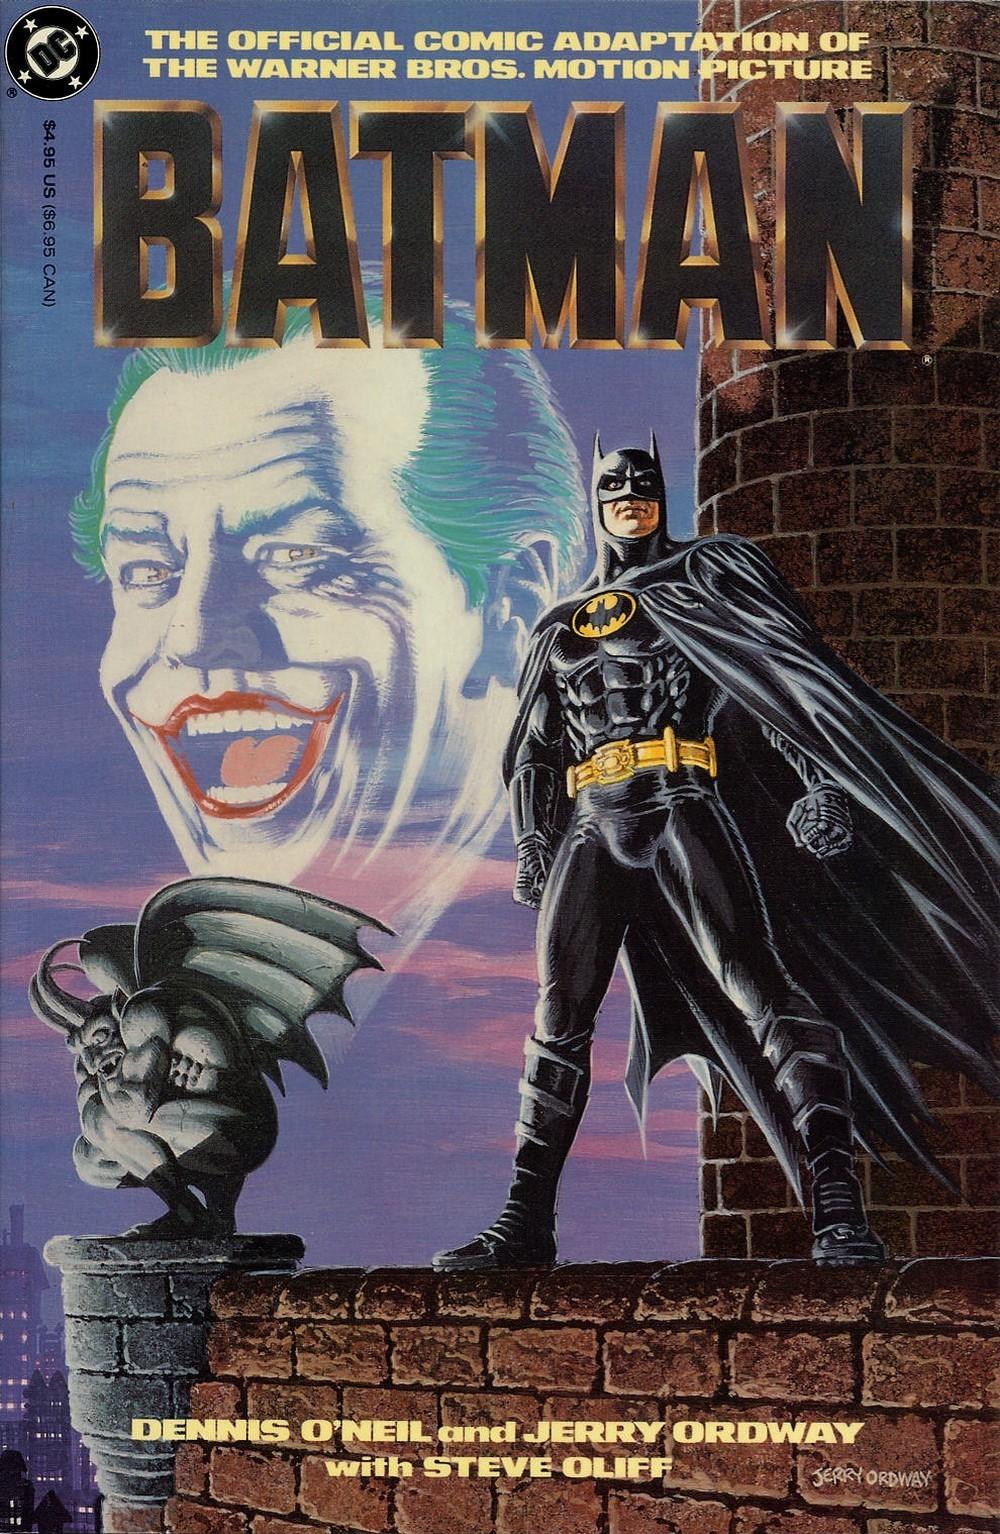 BatmanMovie1989ComicAdaptation.jpg